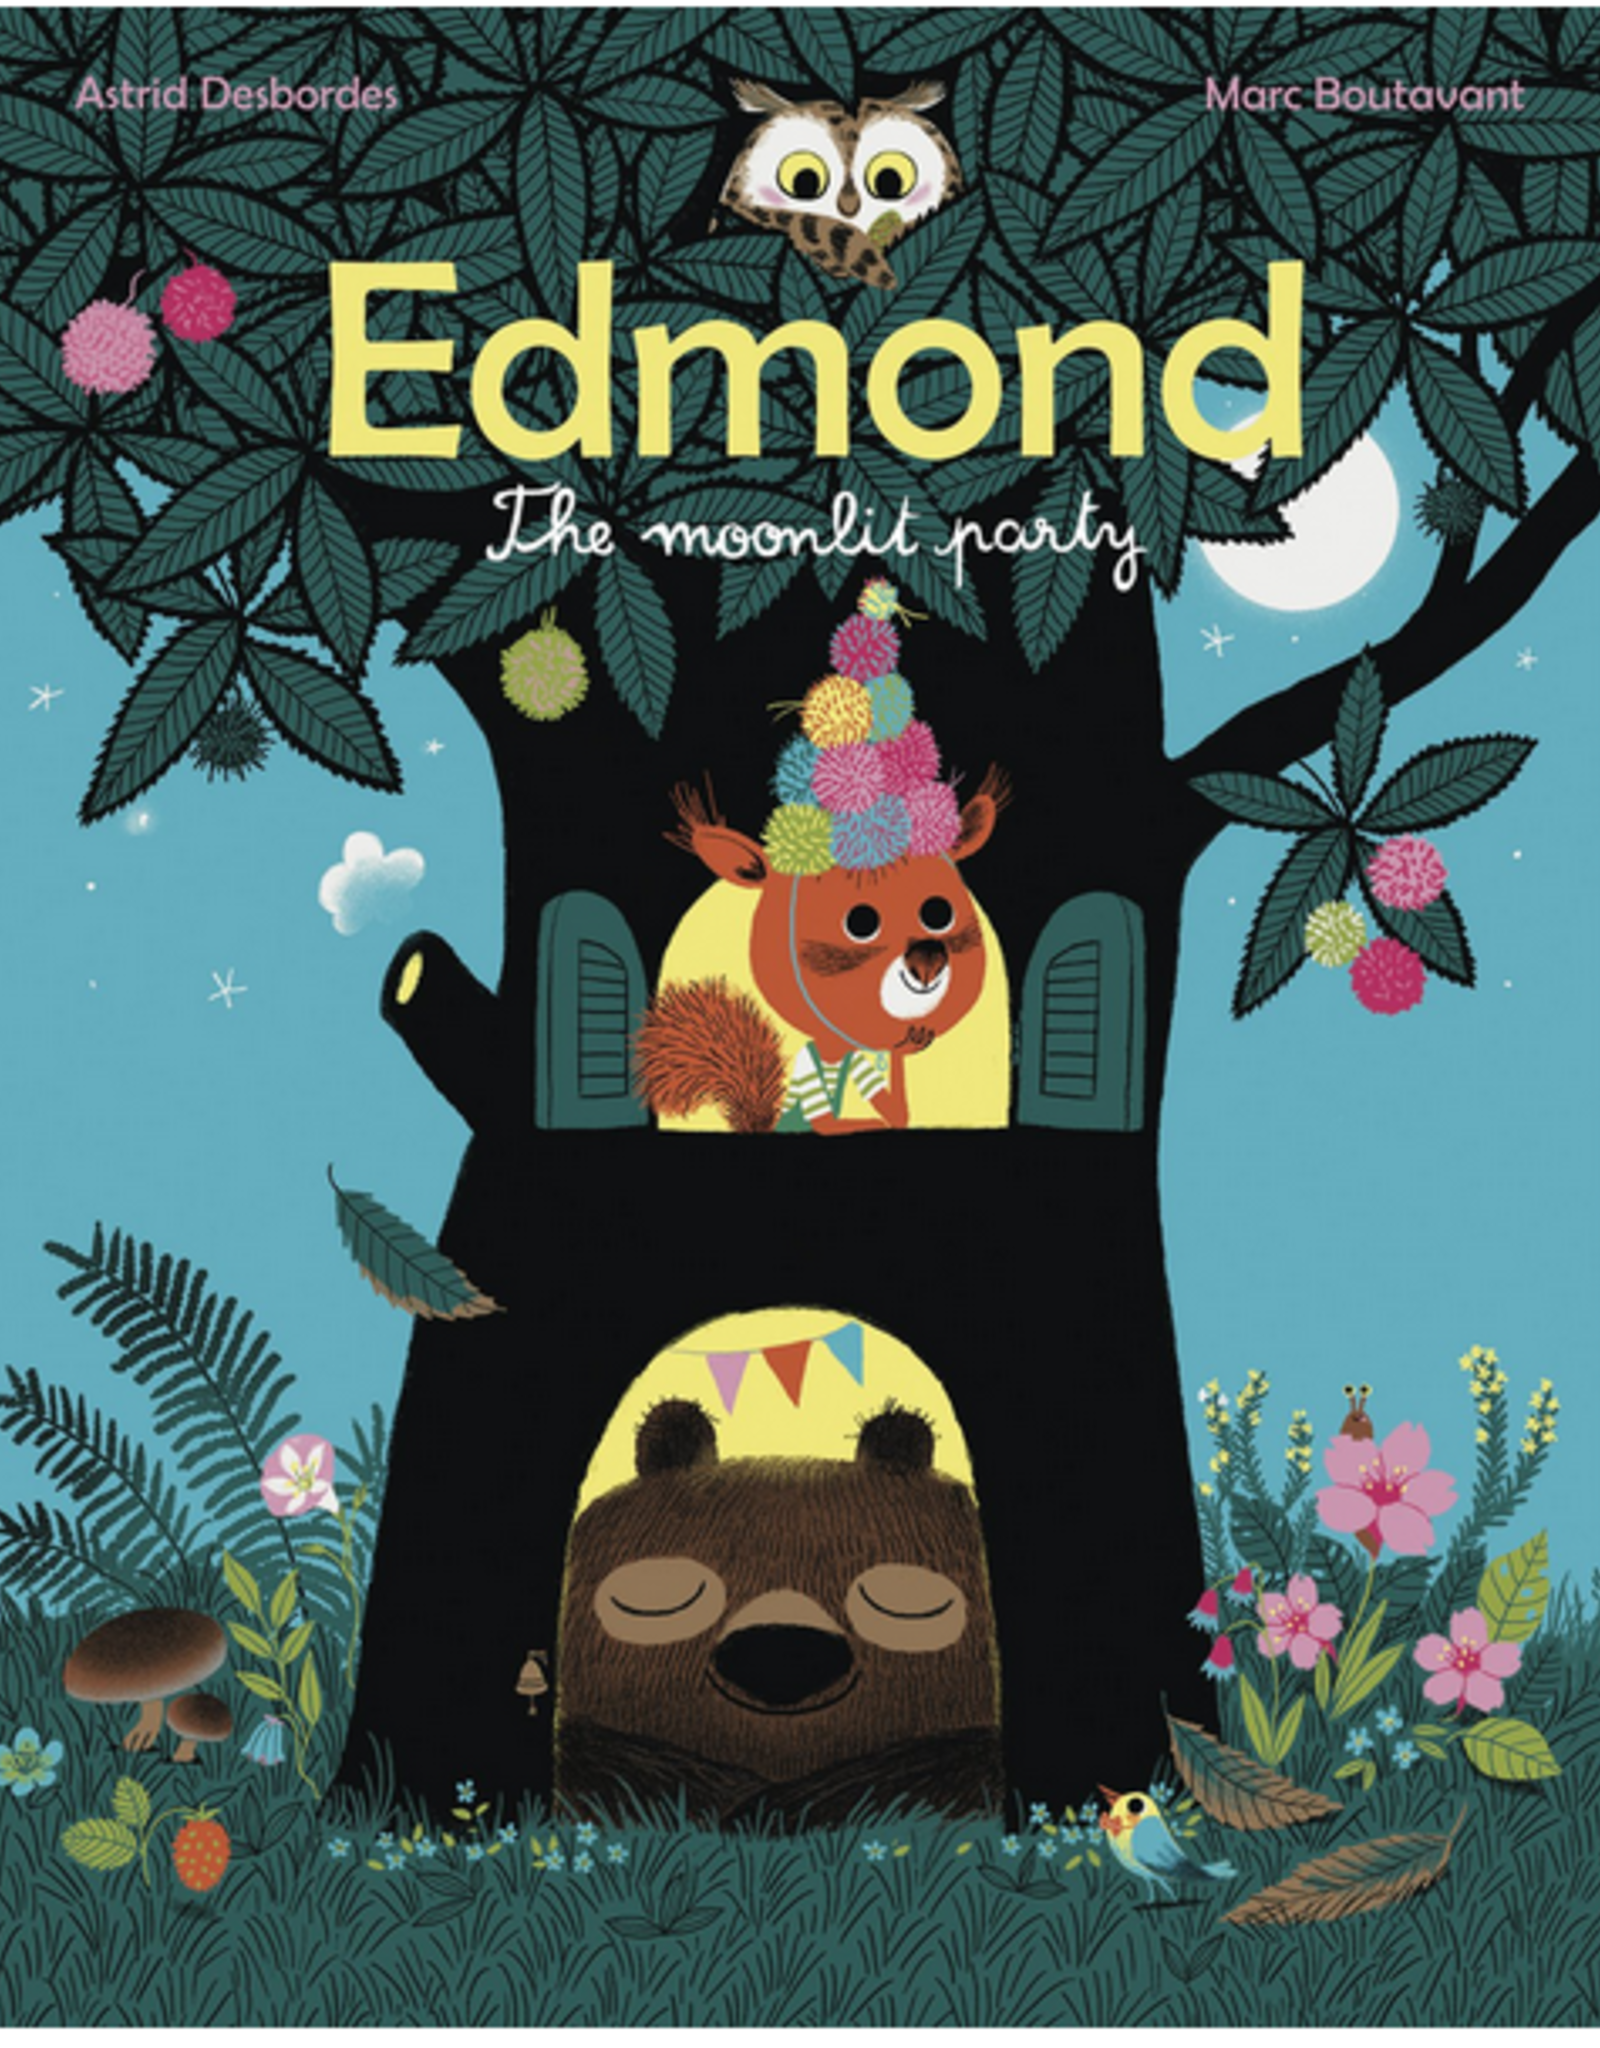 Ingram Edmond the Moonlit Party